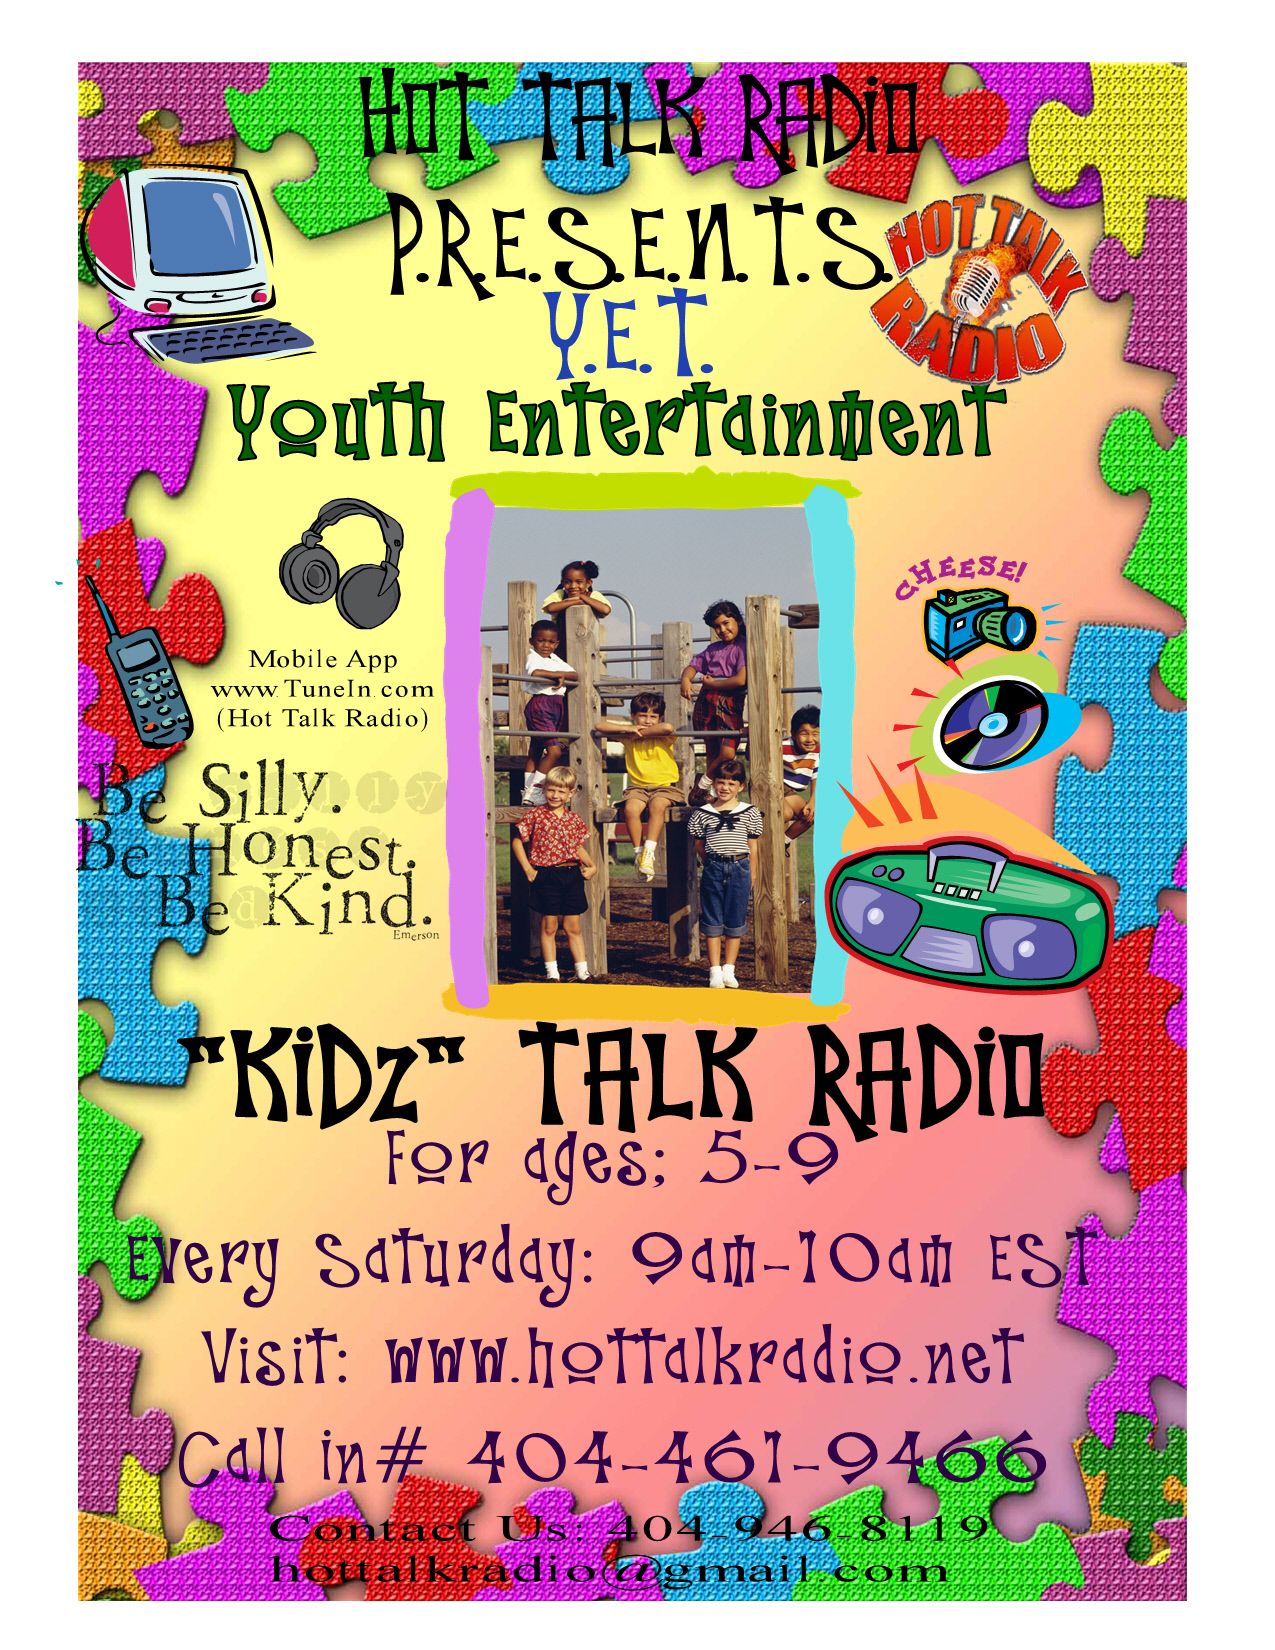 talk show flyer_004.jpg